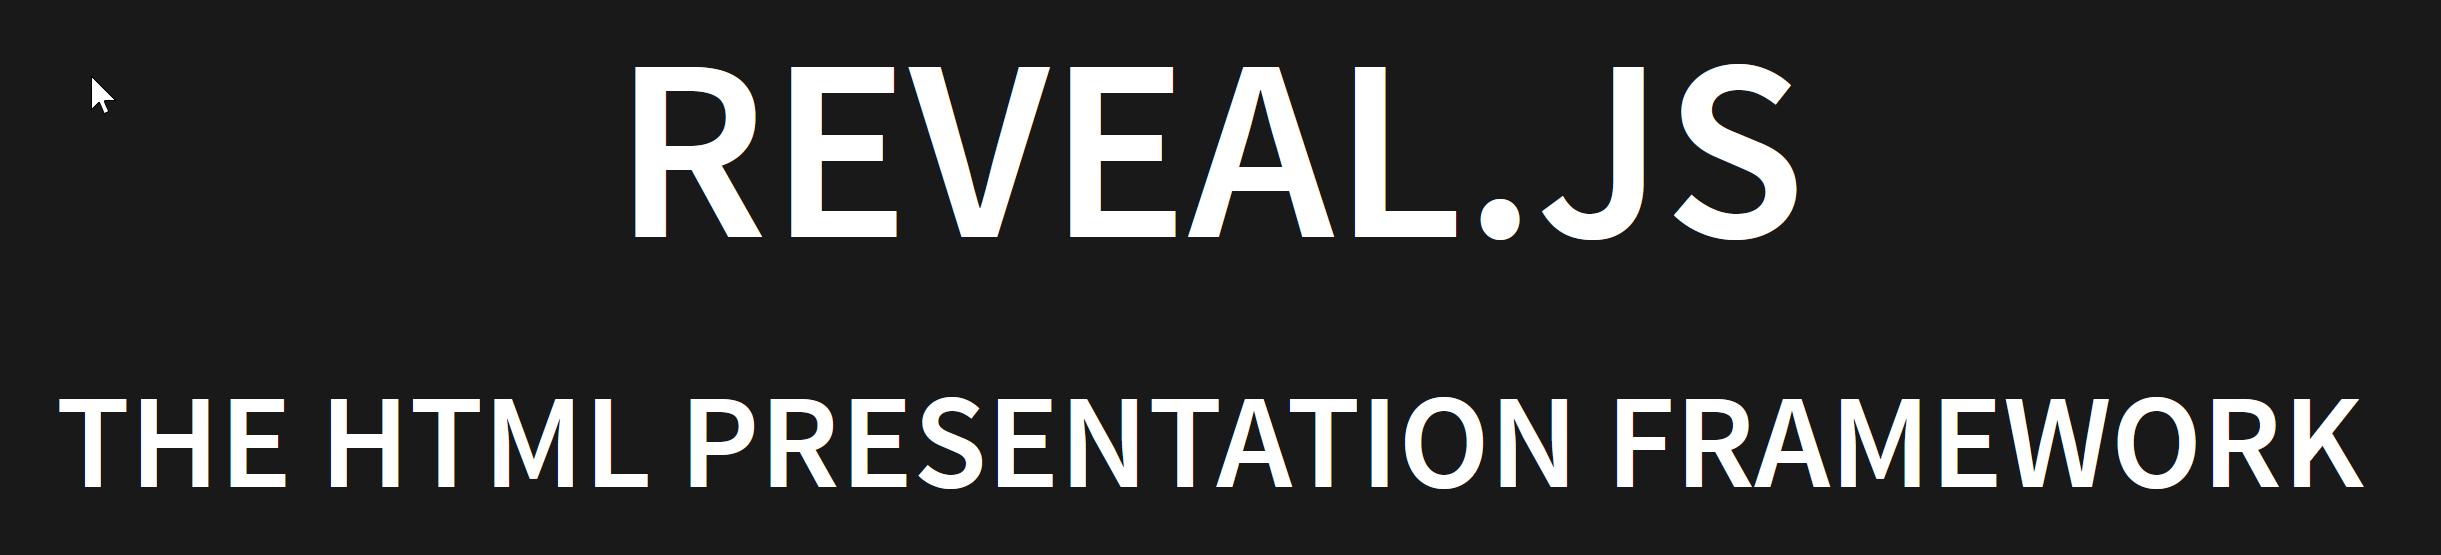 reveal.js logo